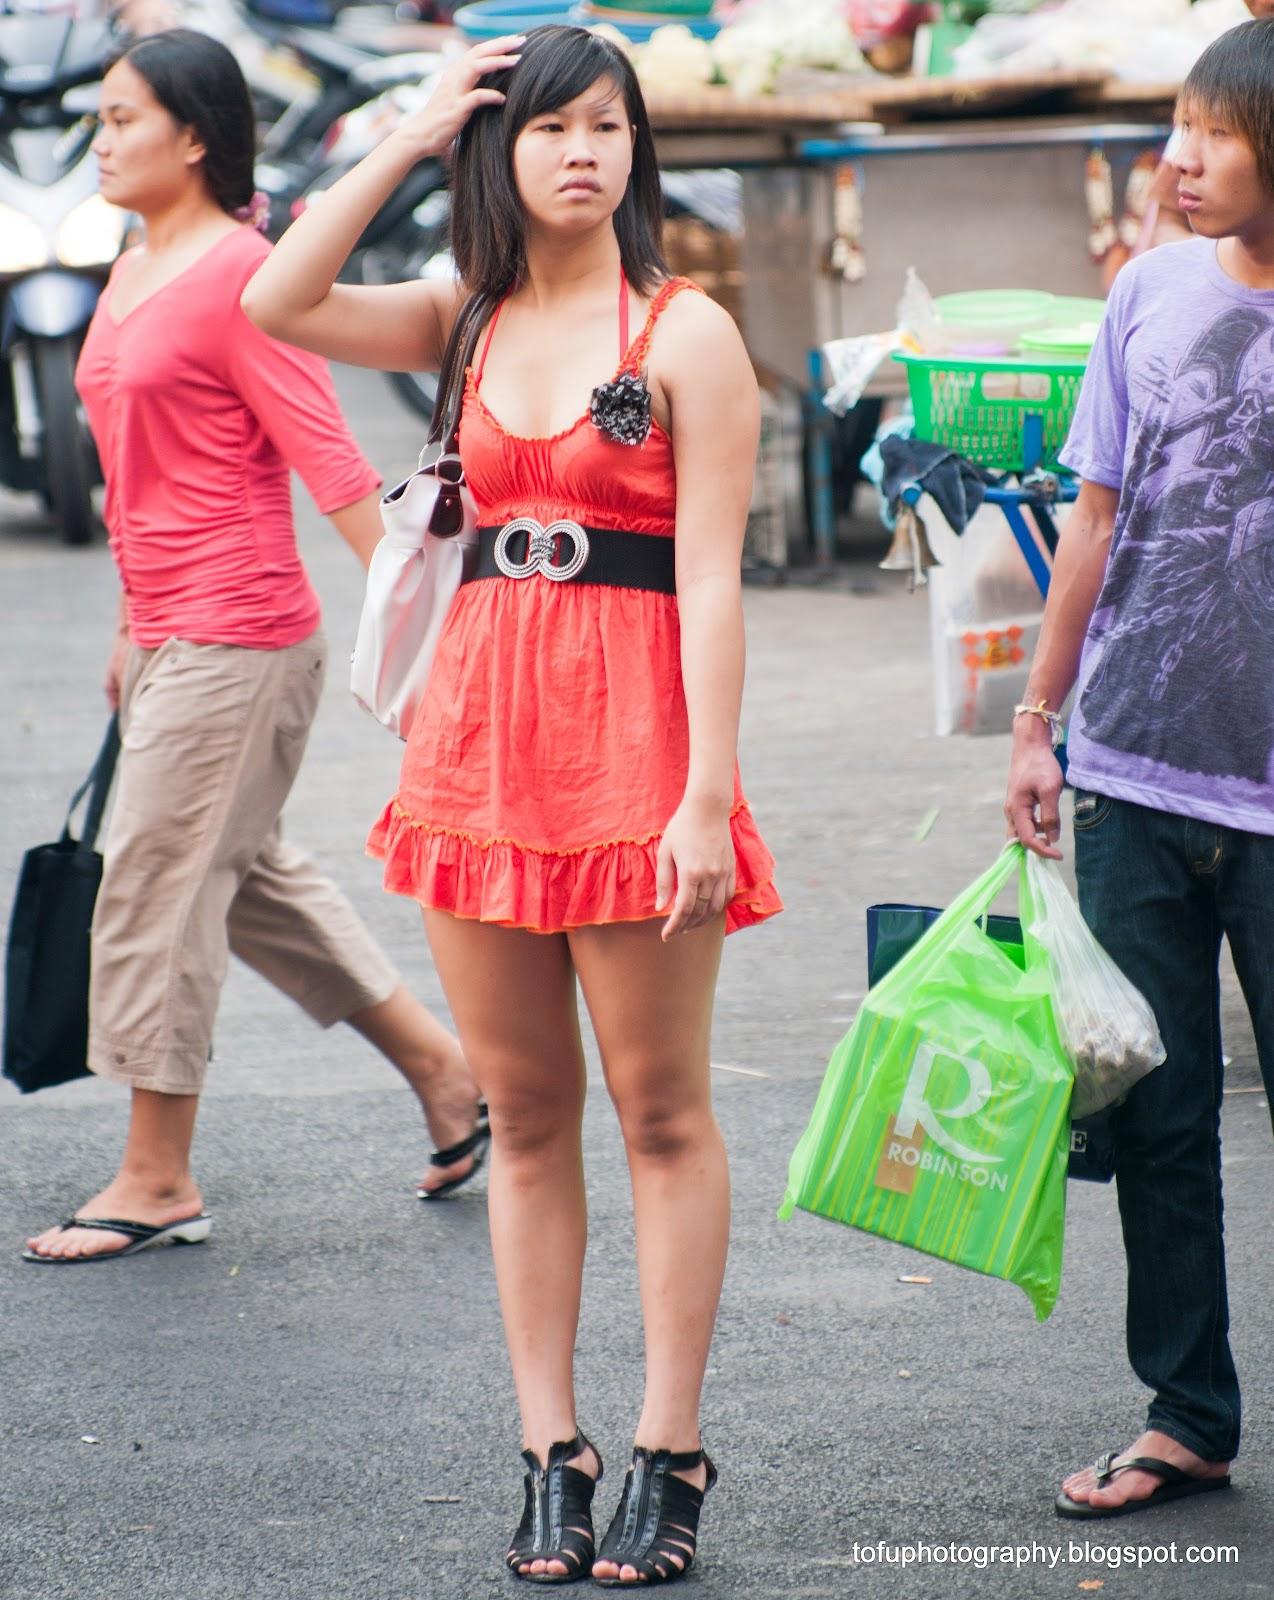 Bangkok Fashion Week: Tofu Photography: Bangkok Fashion Plate